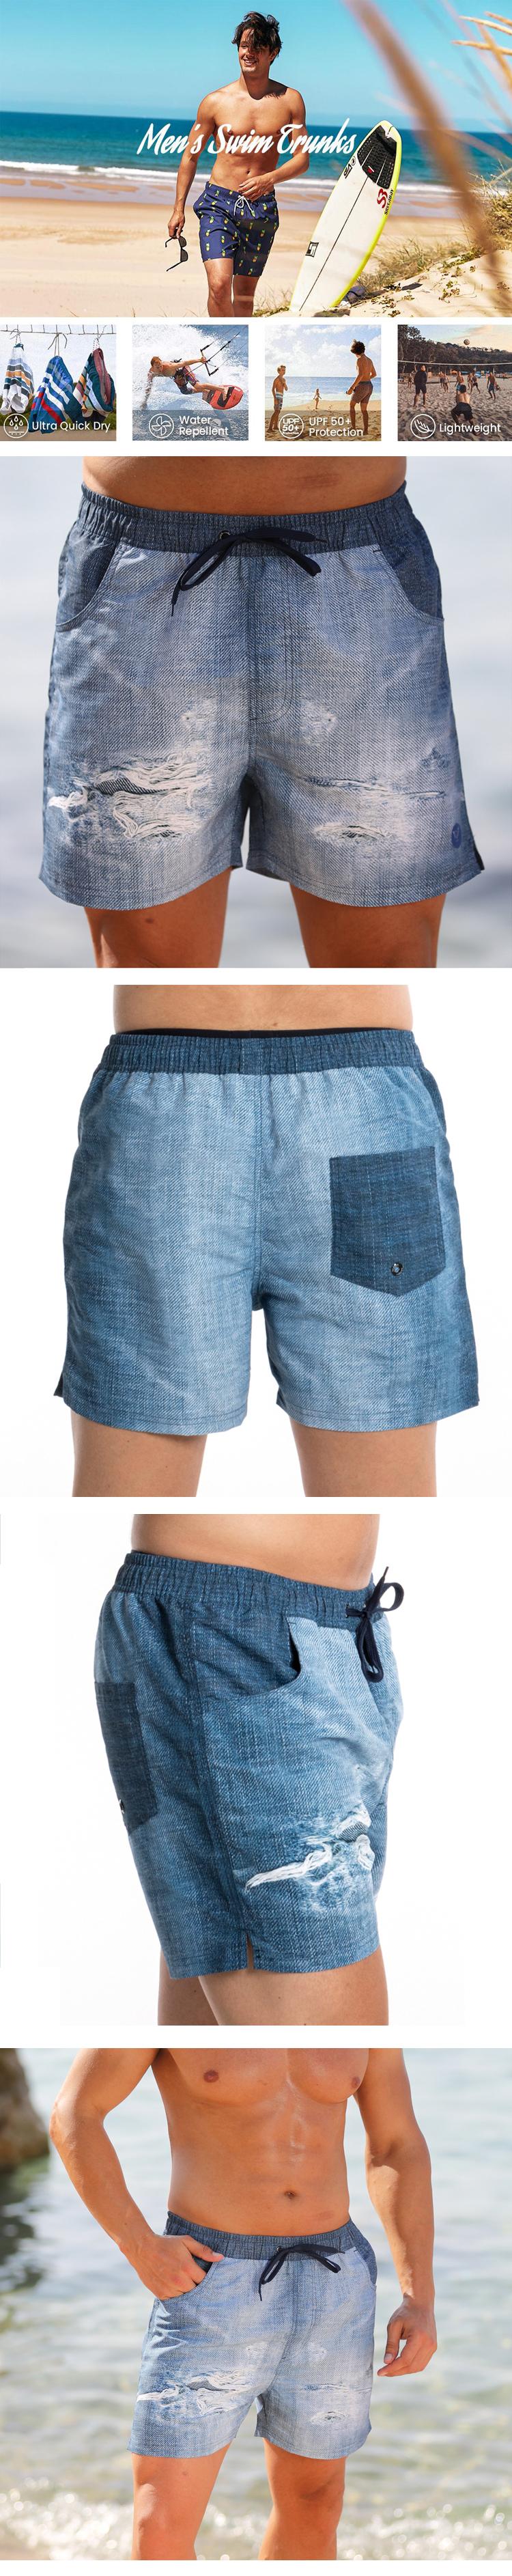 Stamgon denim drawstring swim trunks Mens surfing borad shorts with pockets (2)